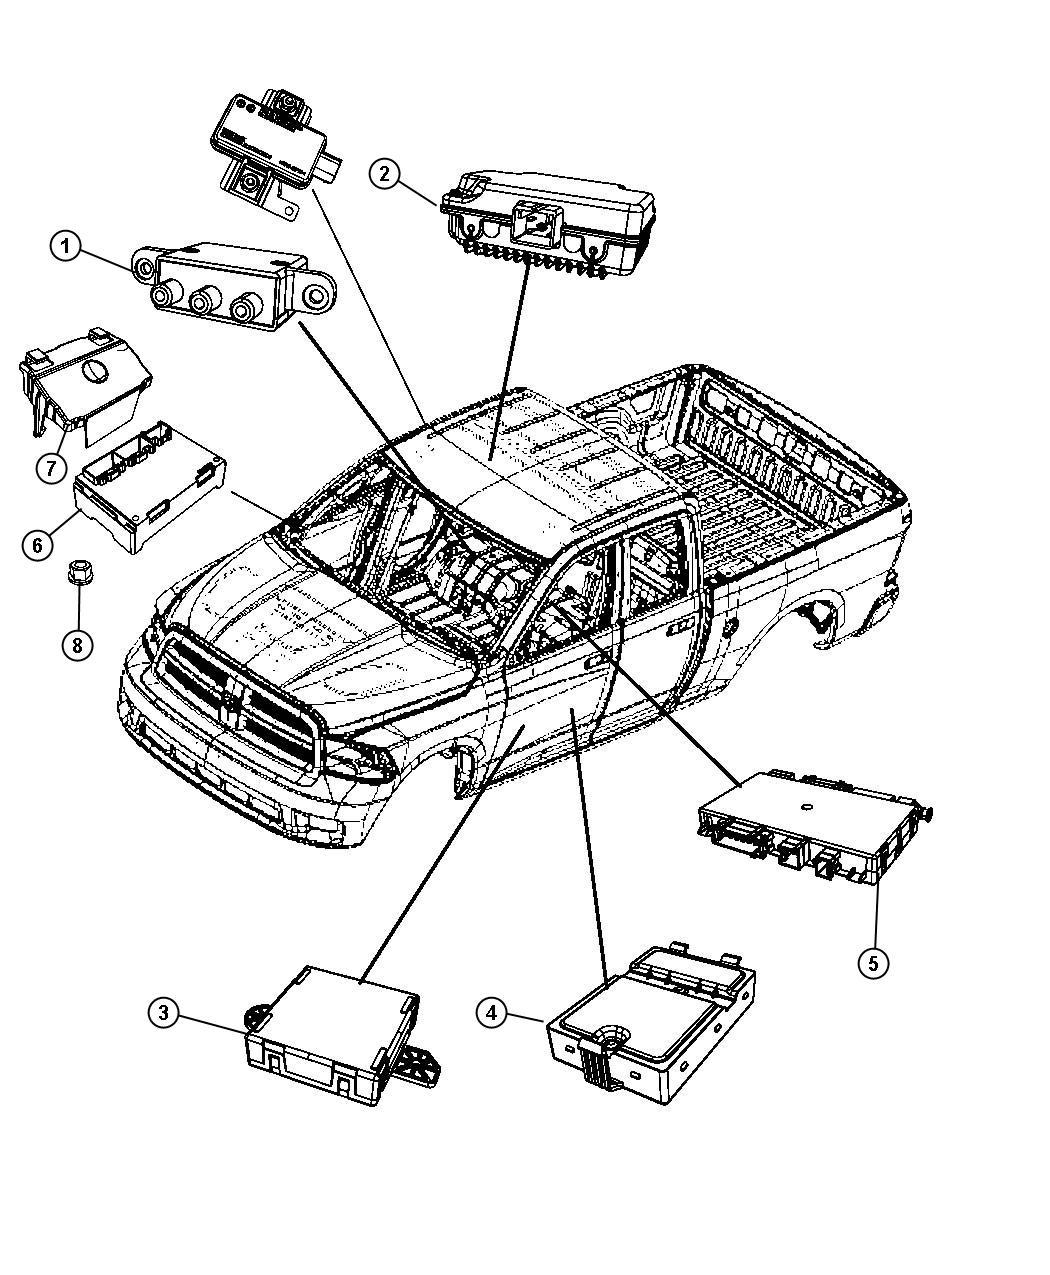 Dodge Ram 3500 Module. Heated seat. Trim: [leather trimmed